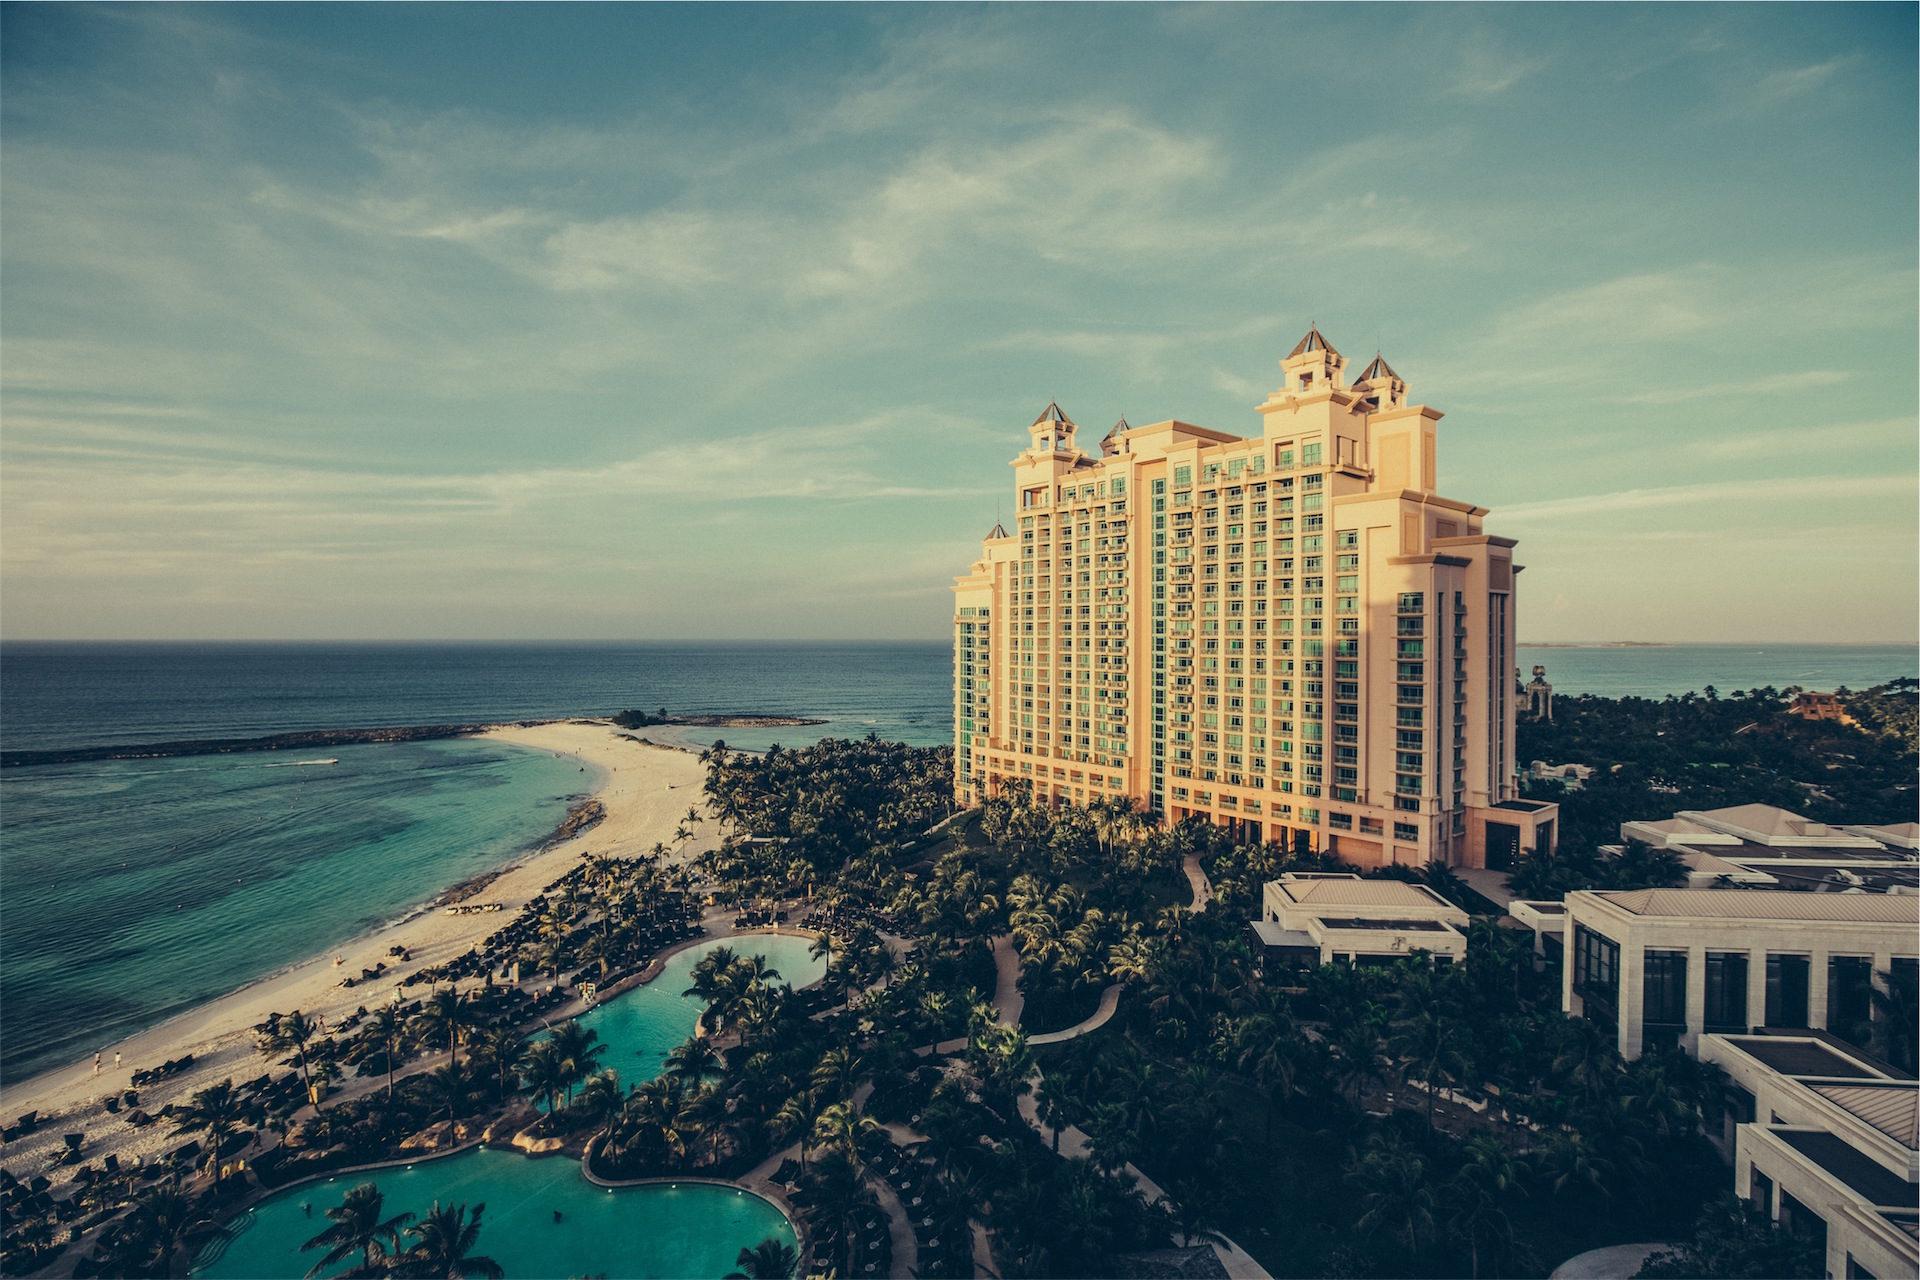 paraiso, hotel, caribe, tropical, 海 - 高清壁纸 - 教授-falken.com